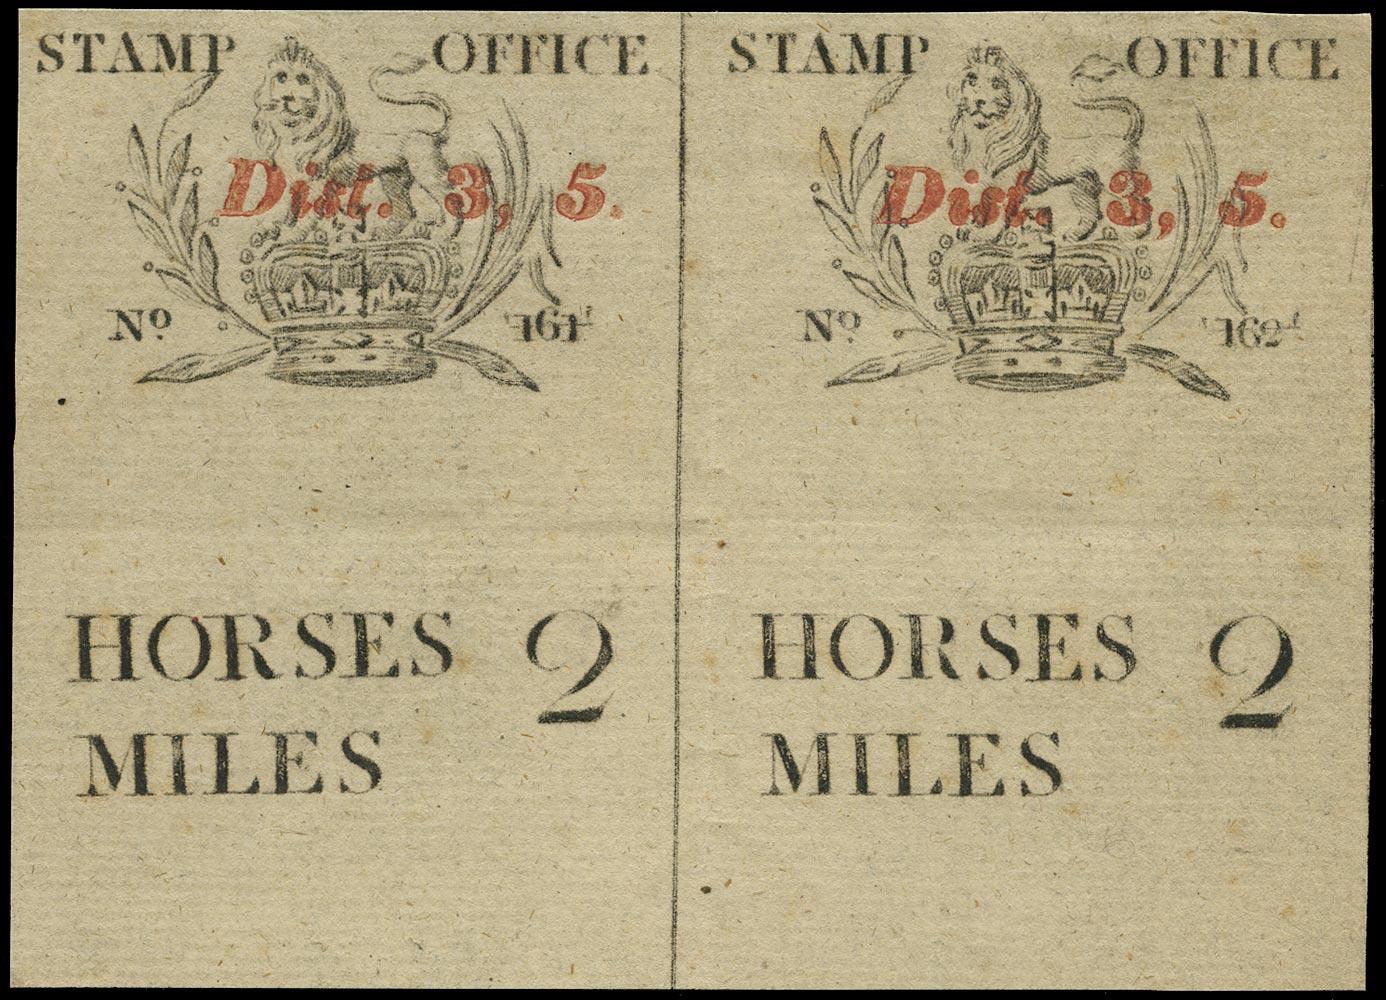 GB 1819 Revenue - Post Horse duty mileage ticket pair.